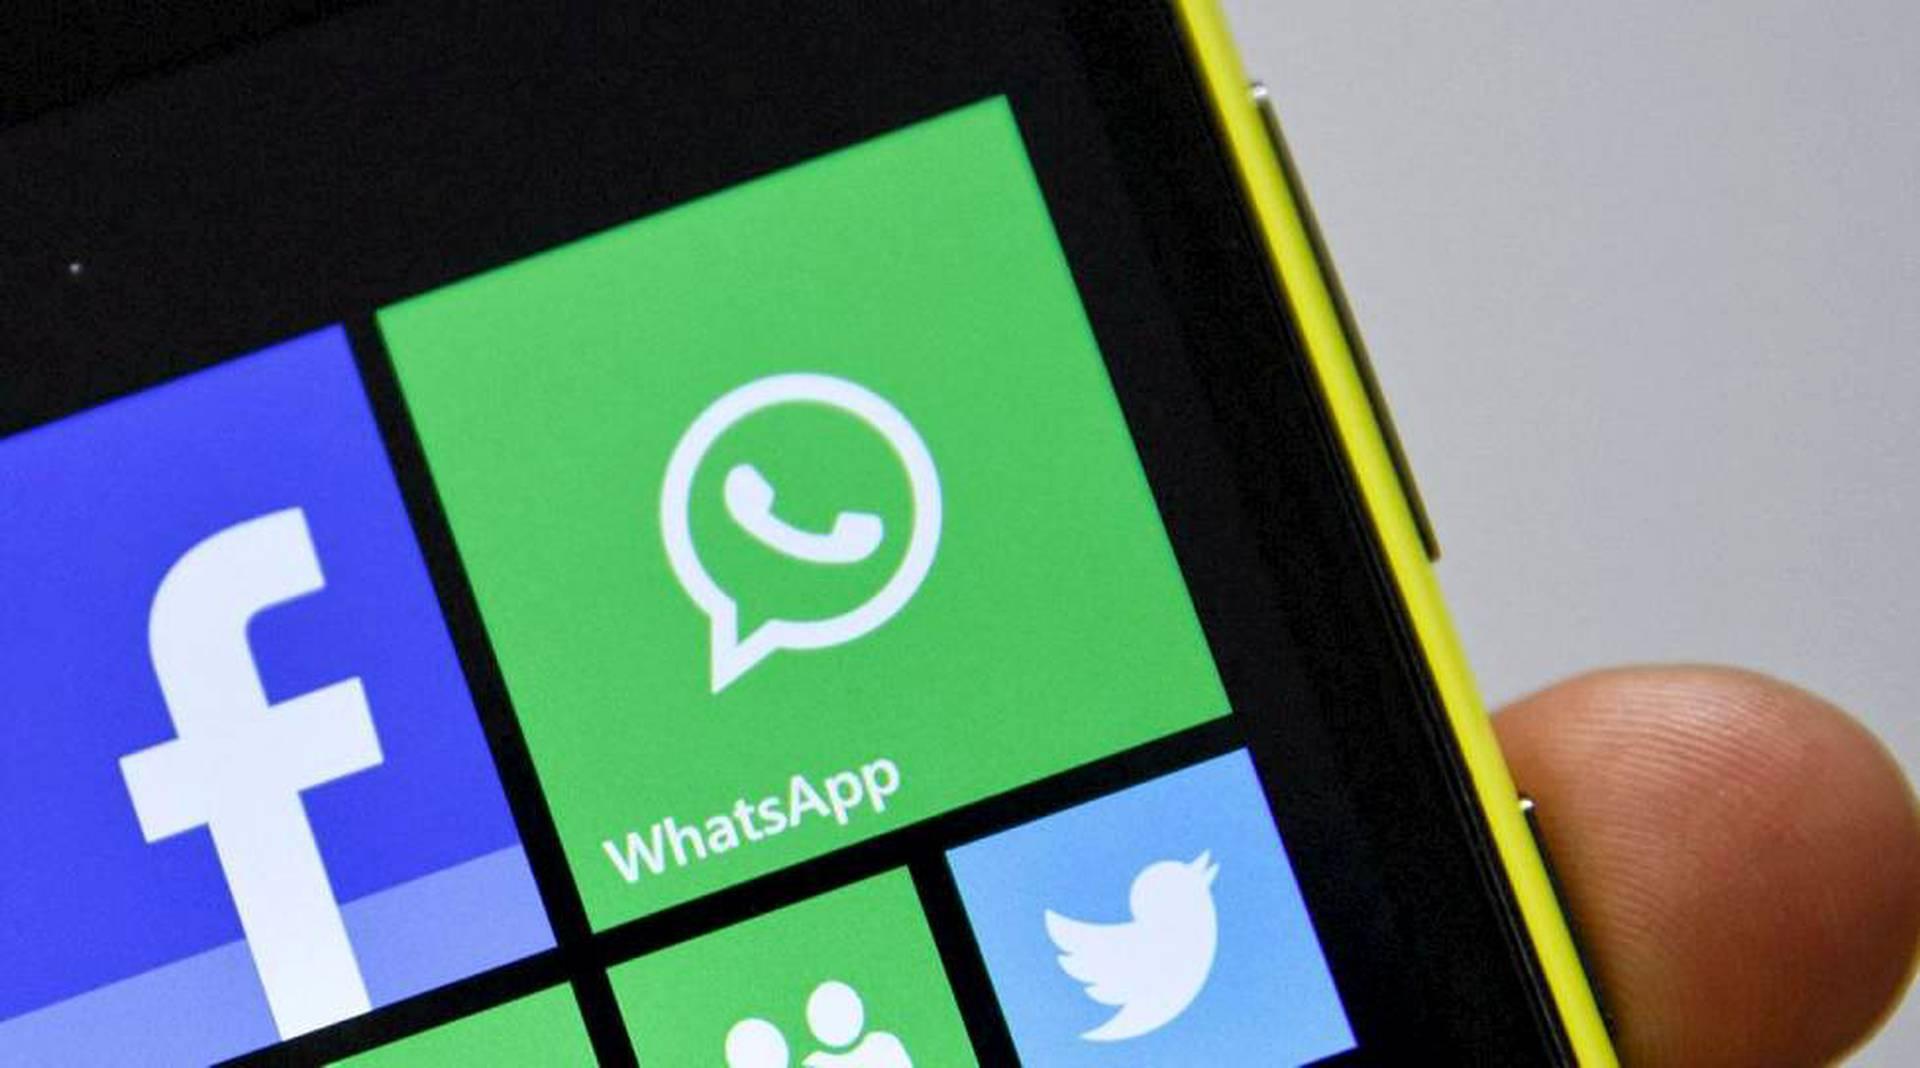 paras kytkennät sovellus Windows Phone salaisuuksia online dating BBC